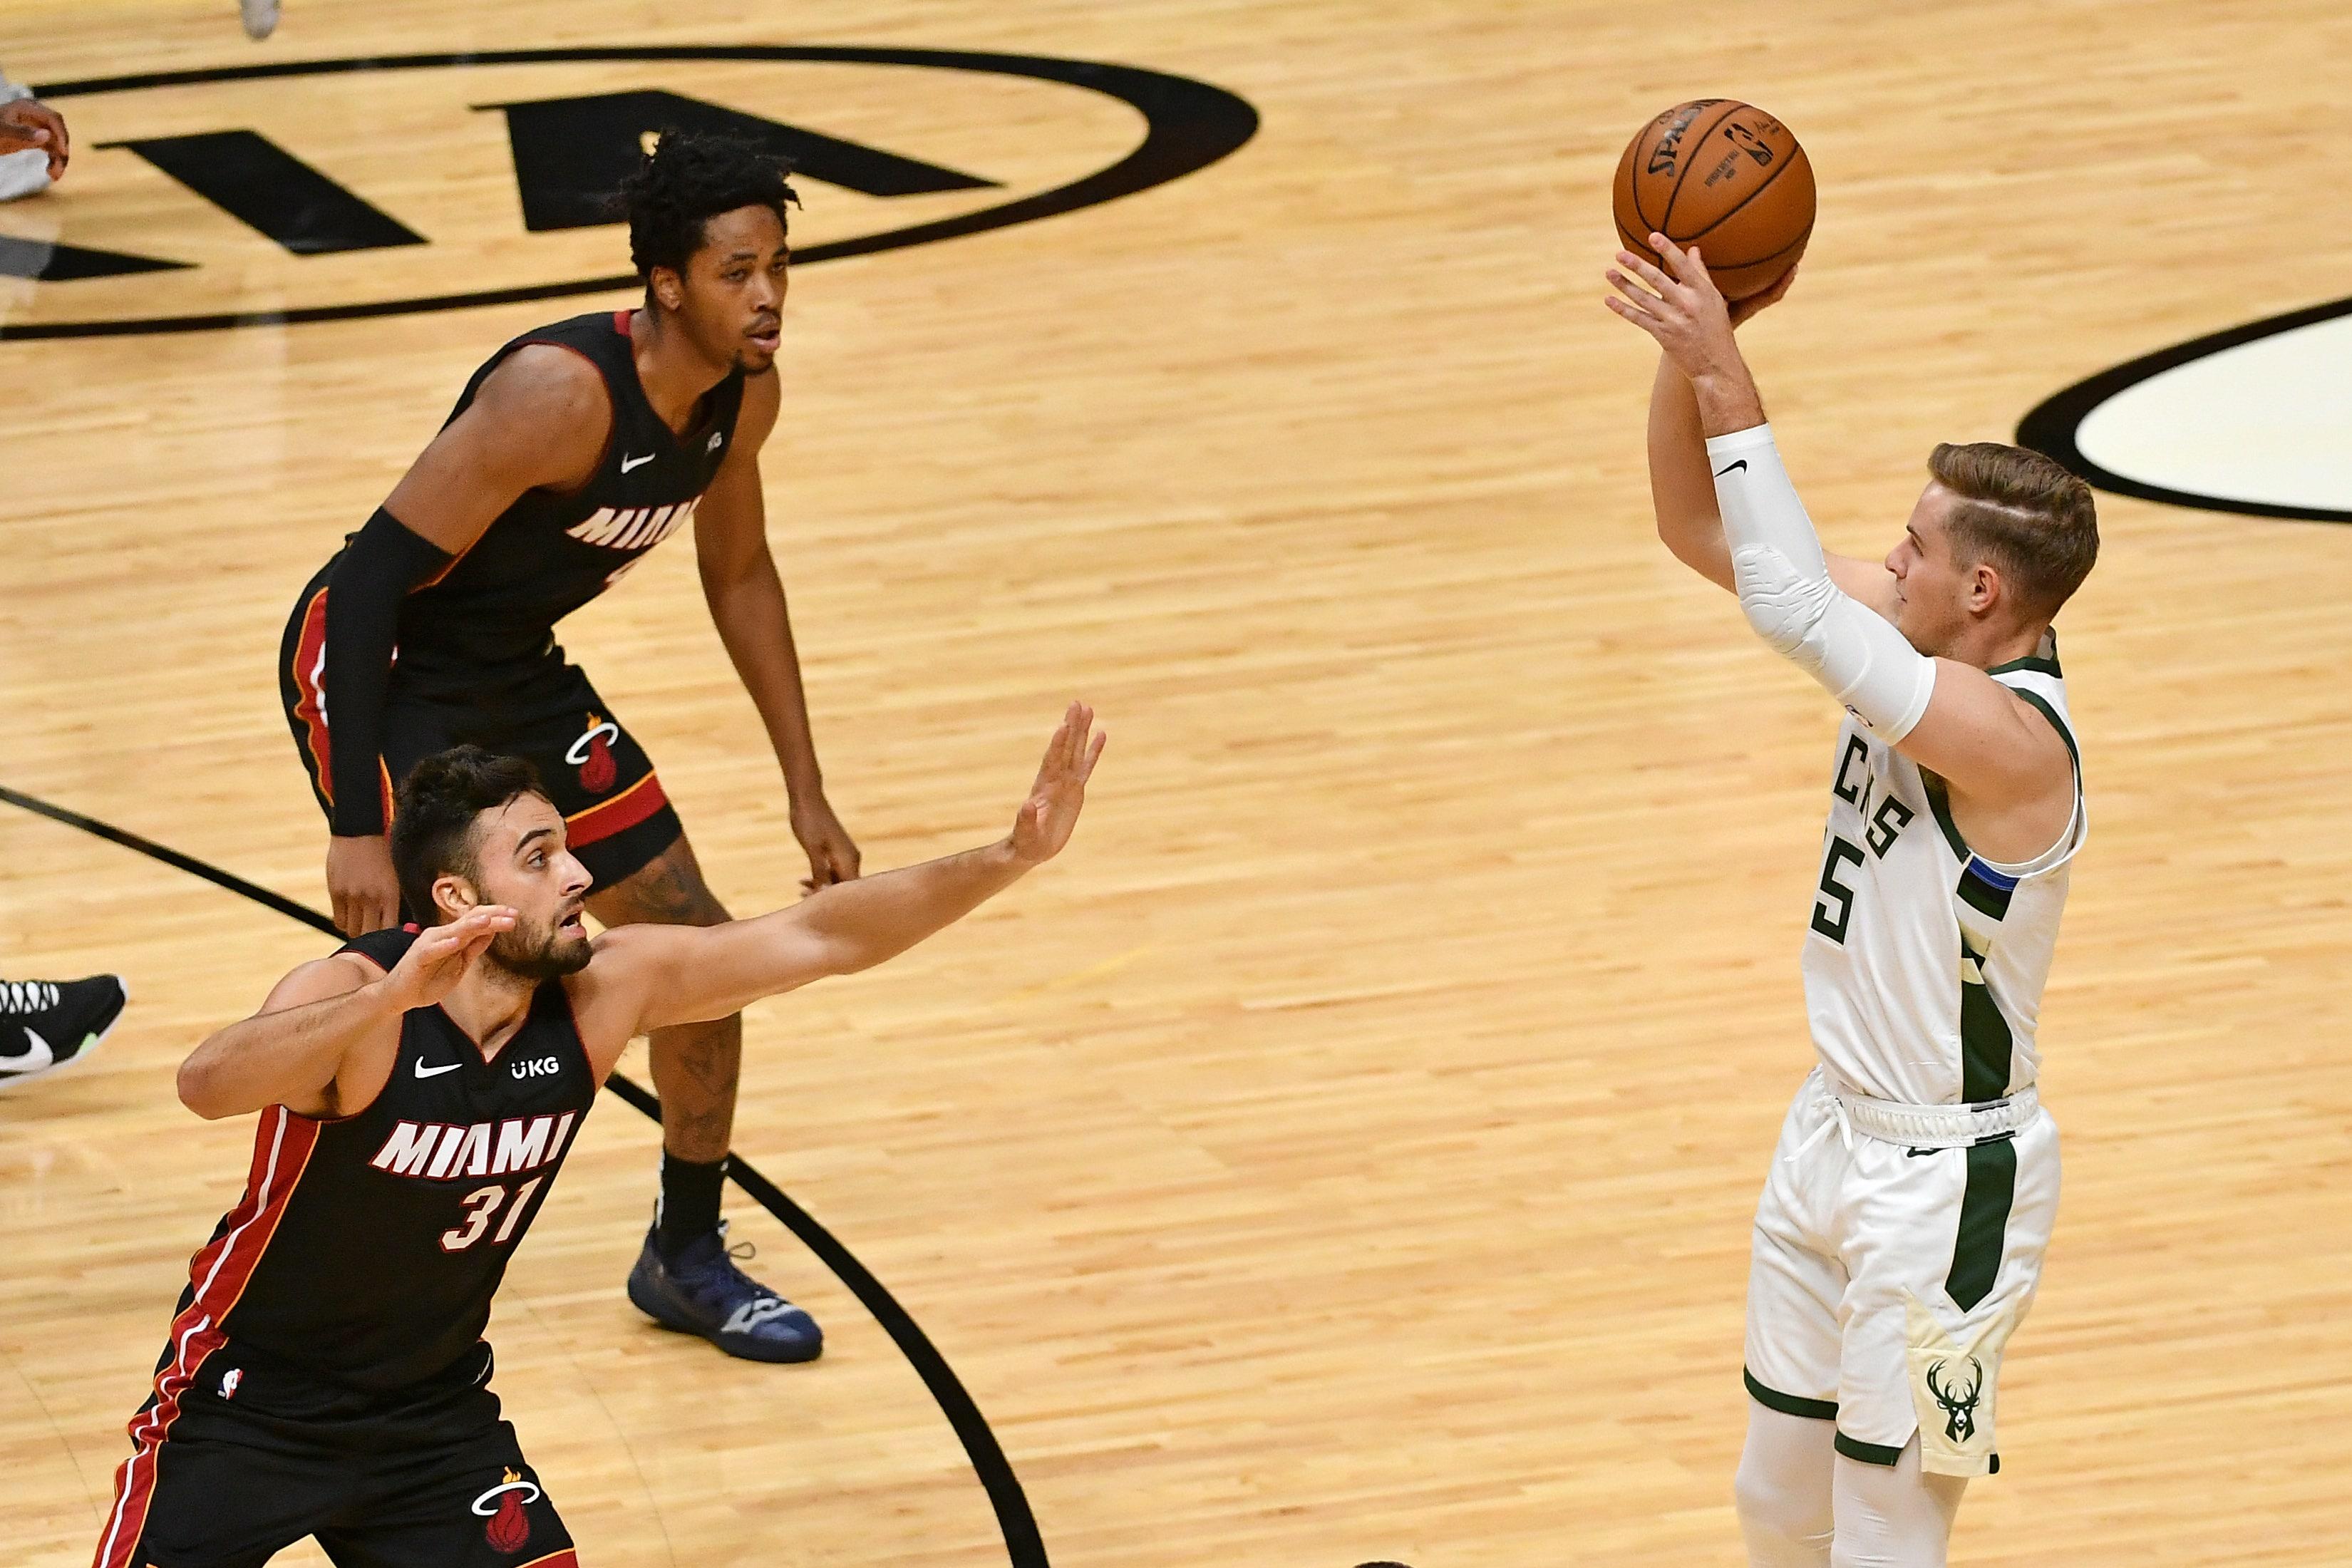 Bucks set NBA record with 29 3-pointers, trounce Heat 144-97 | FOX Sports